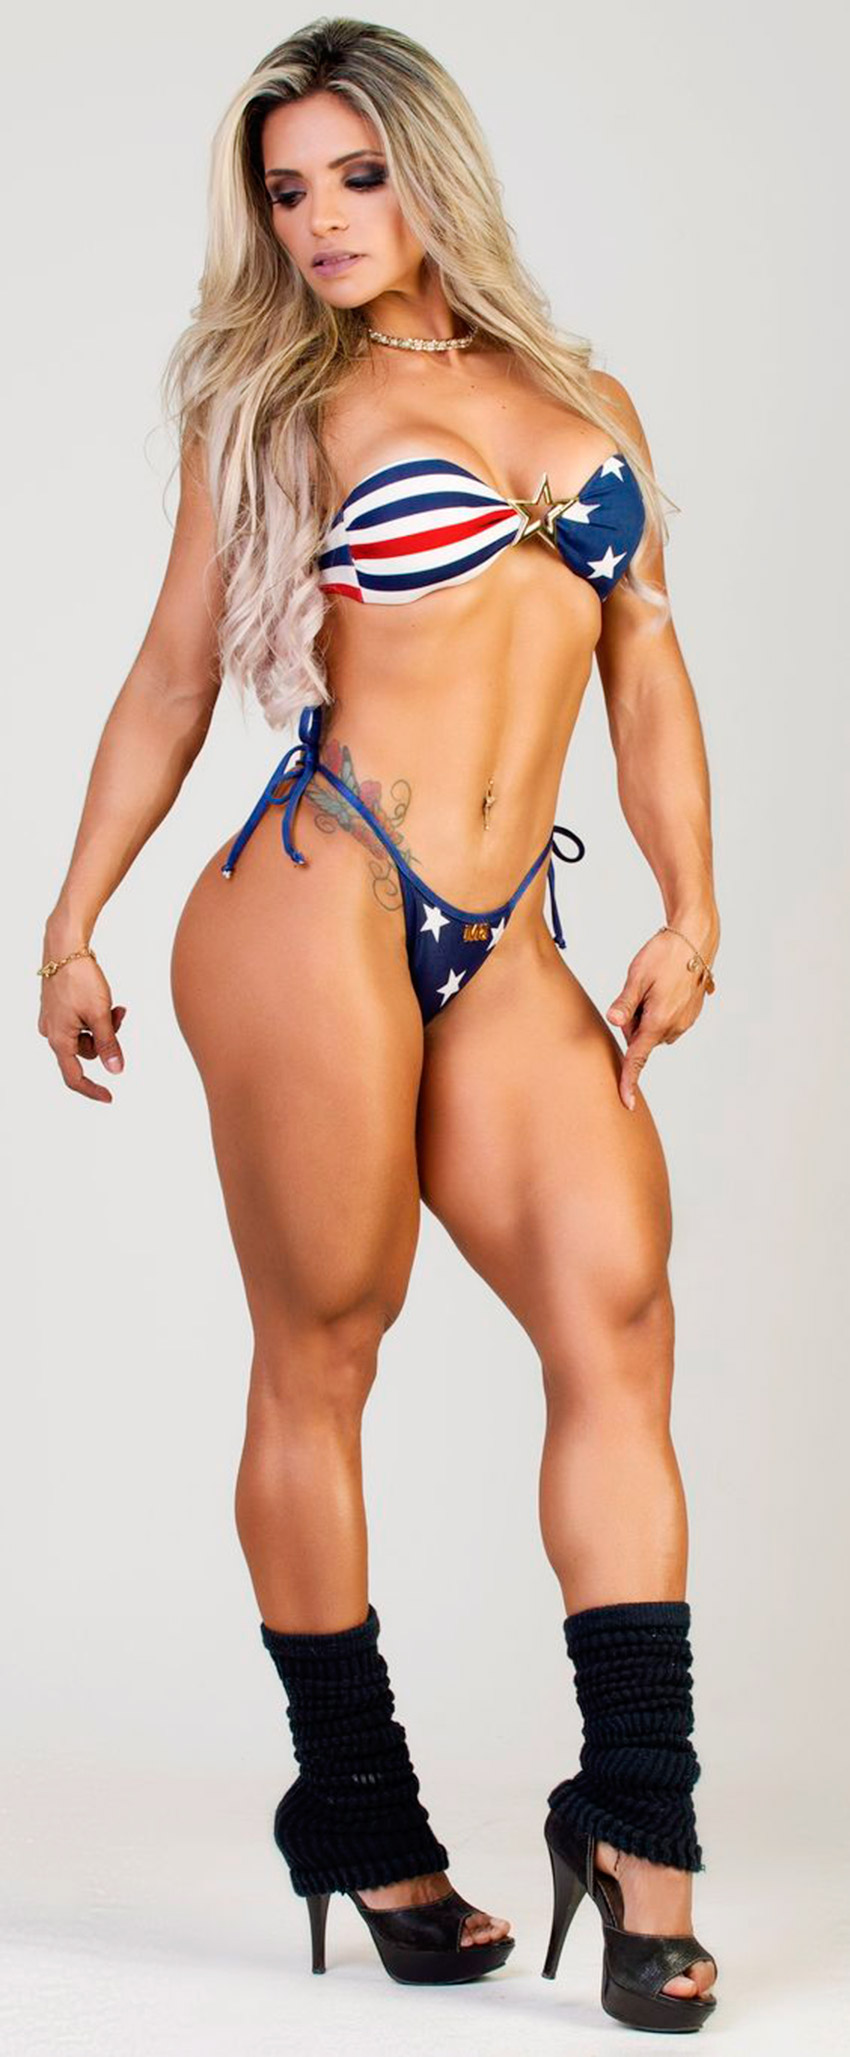 Aline Barreto flexing legs in bikini